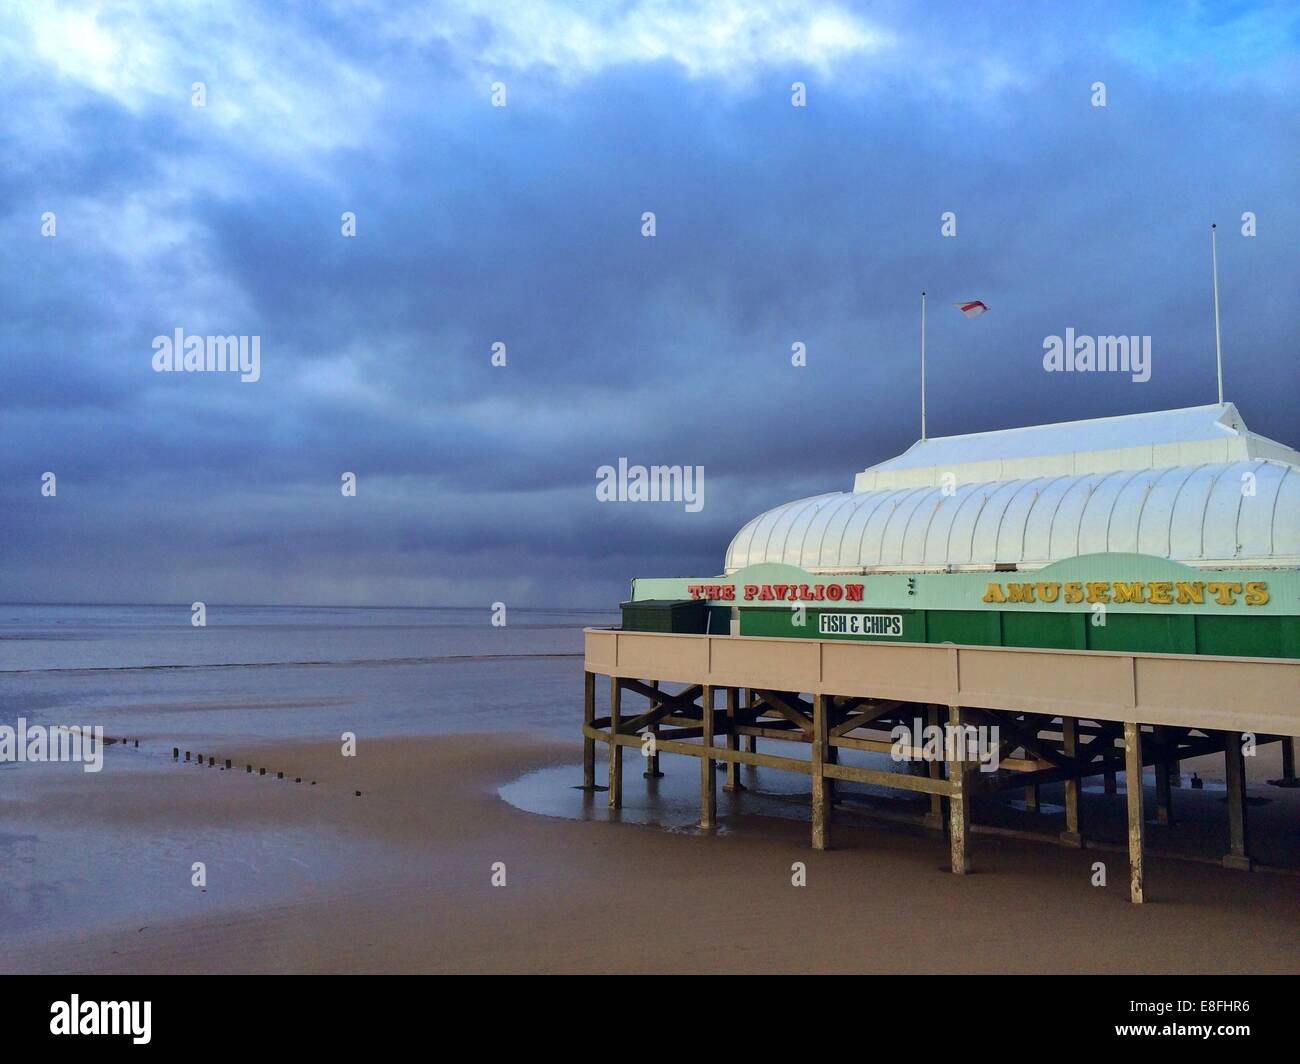 Pavilion and pier, Burnham-on-Sea, somerset, UK - Stock Image